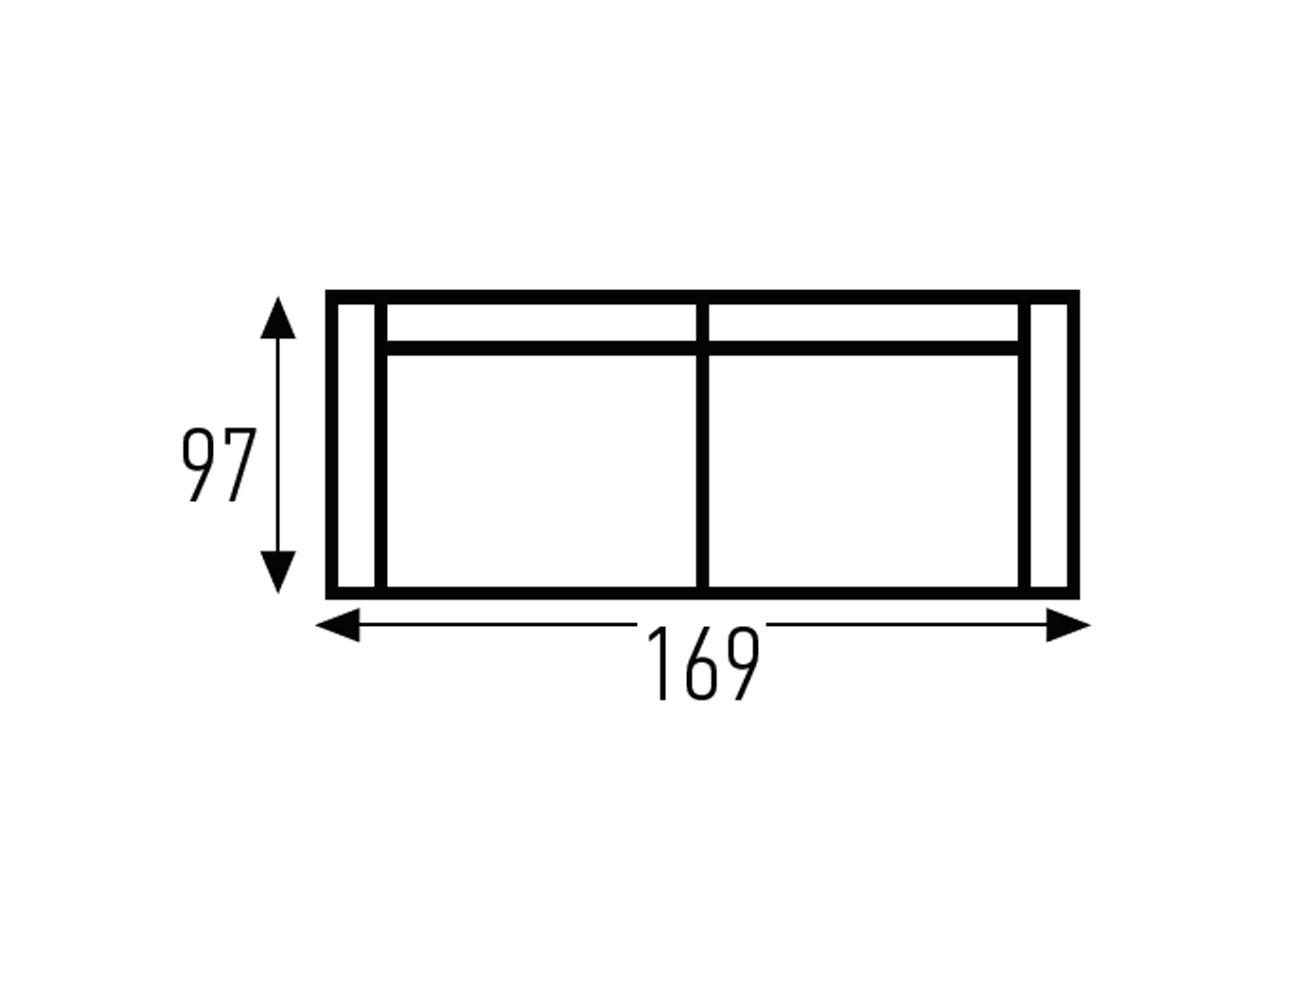 Croquis sofa 3 plaza 1696